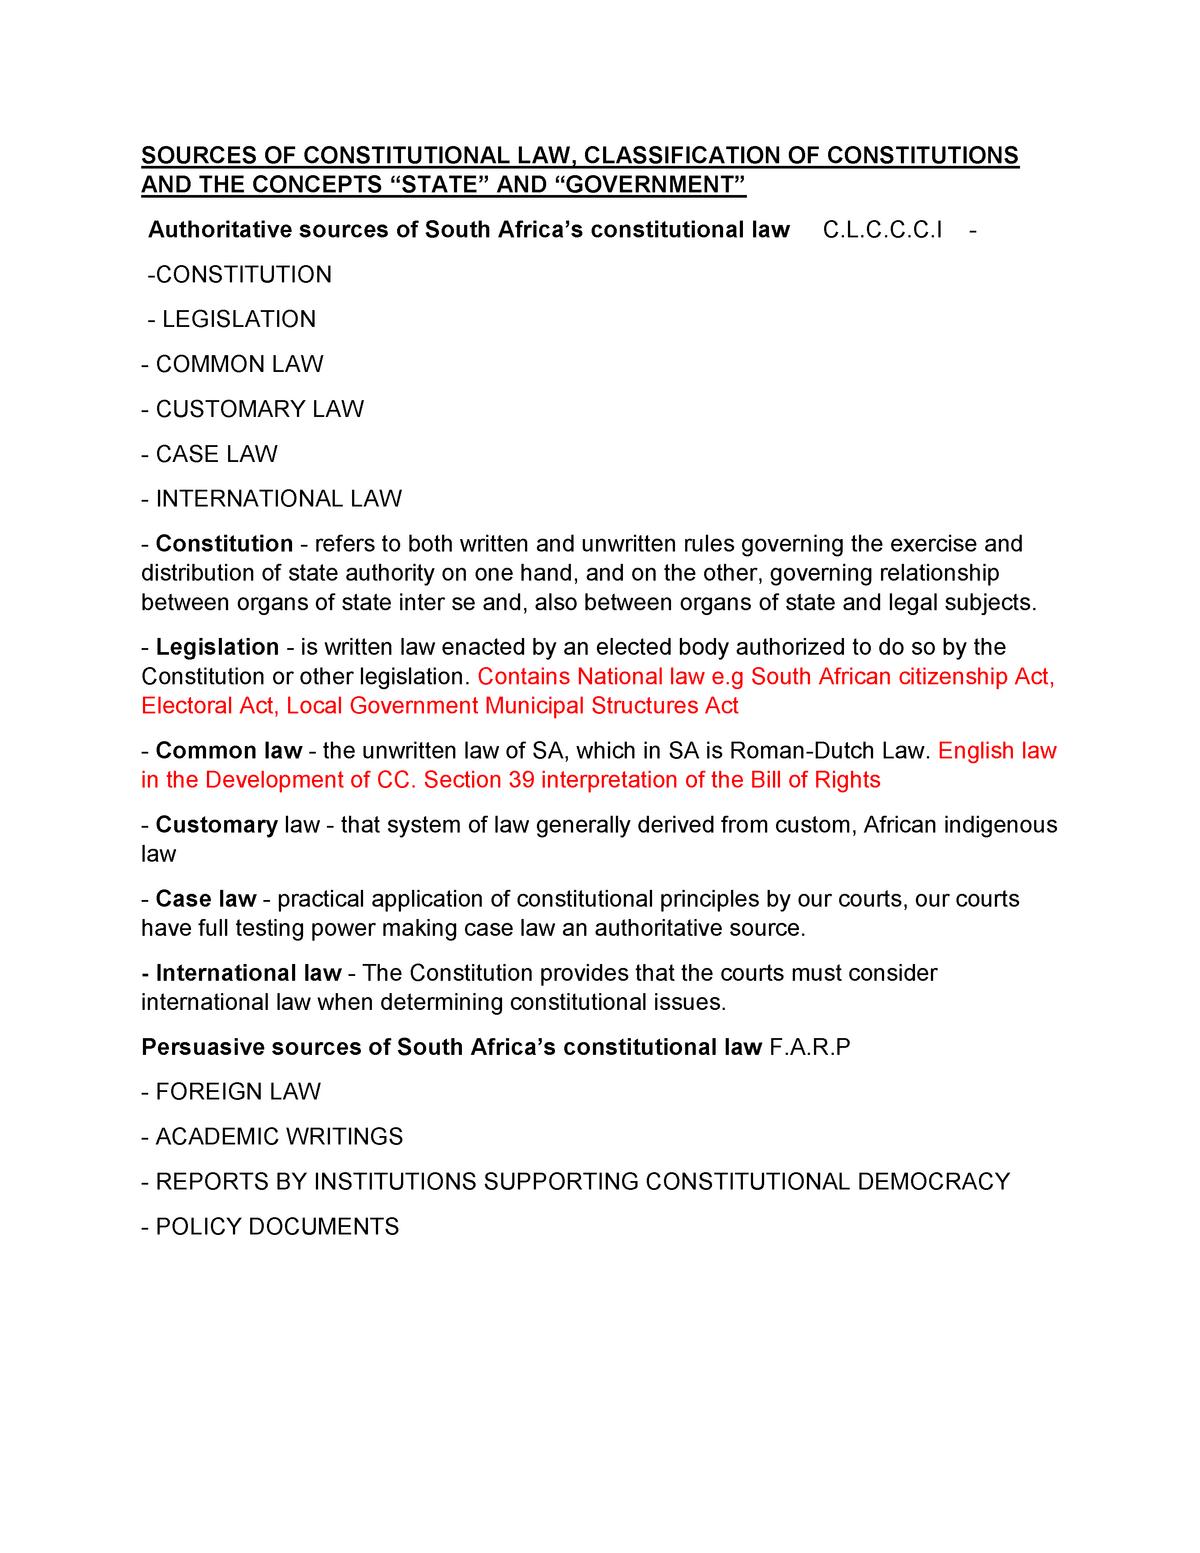 CONSTITUTIONAL LAW STUDY NOTES - LAW CSL2601 - UNISA - StuDocu